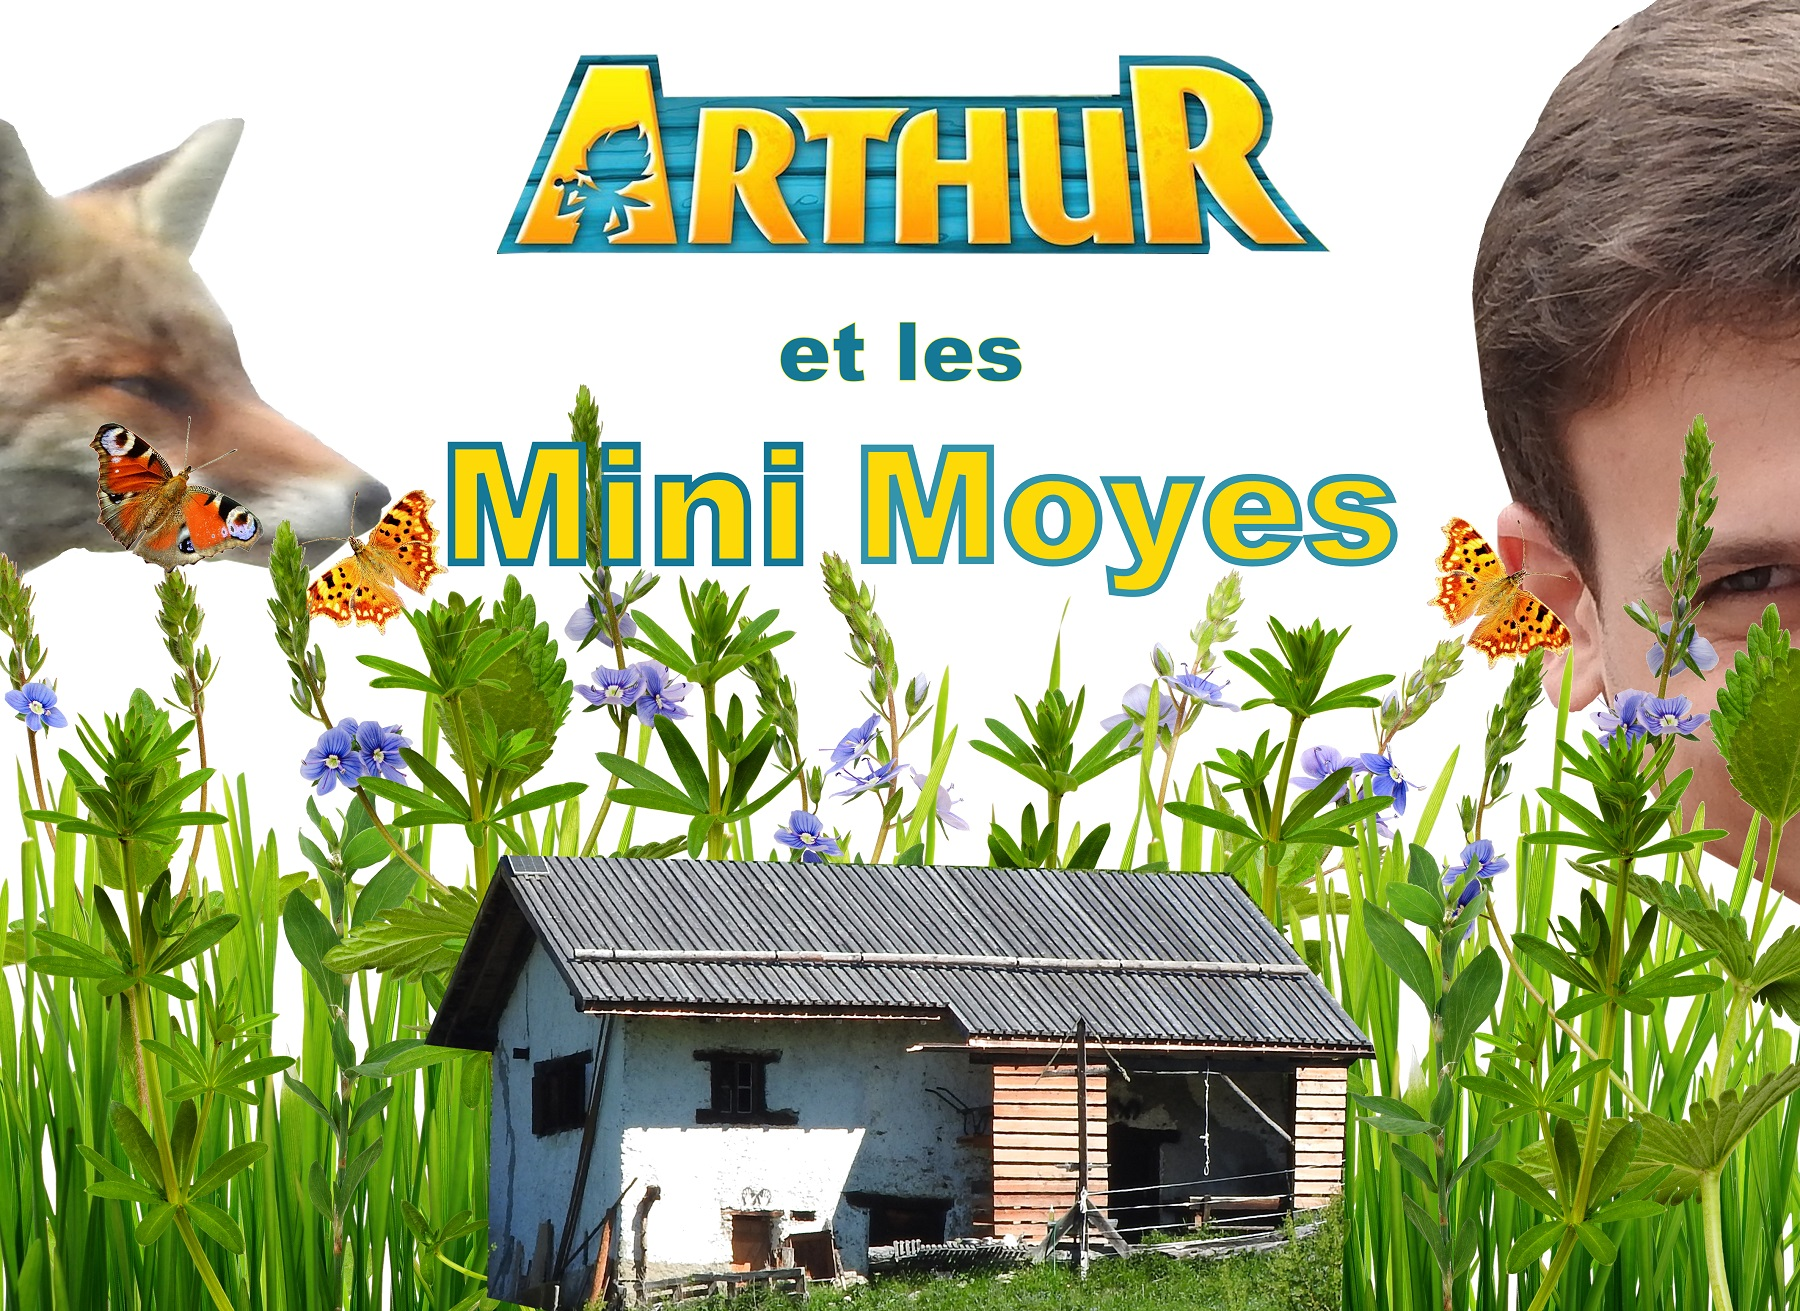 MiniMoyesLéger